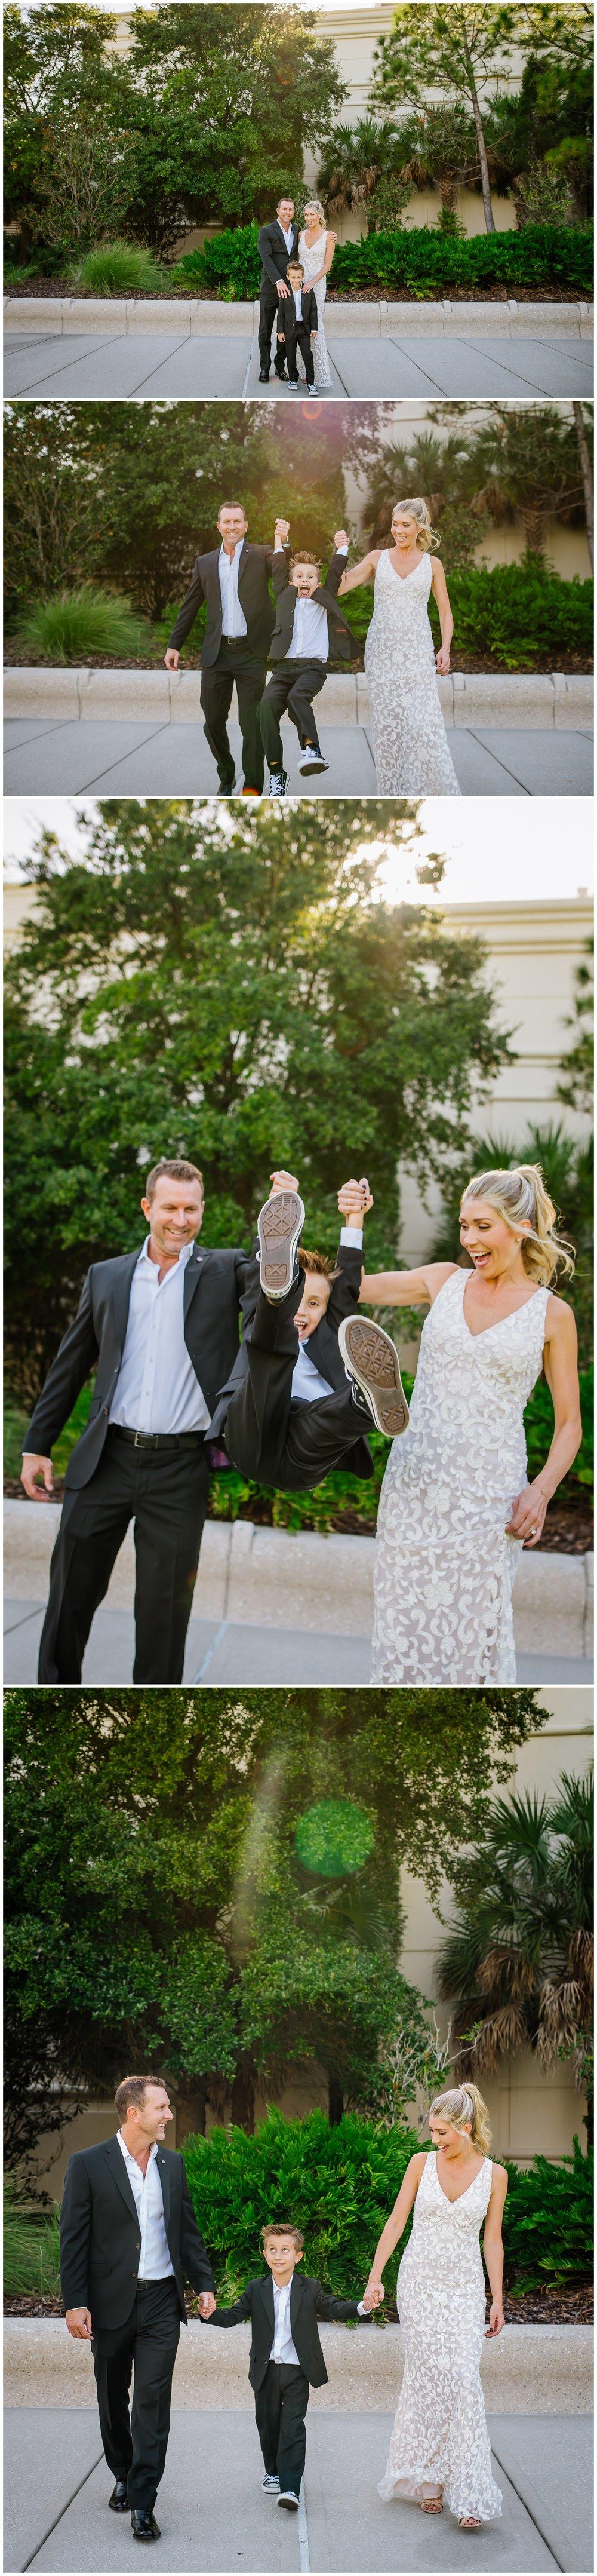 Tampa-wedding-photographer-downtown-bhldn-intimate_0017.jpg